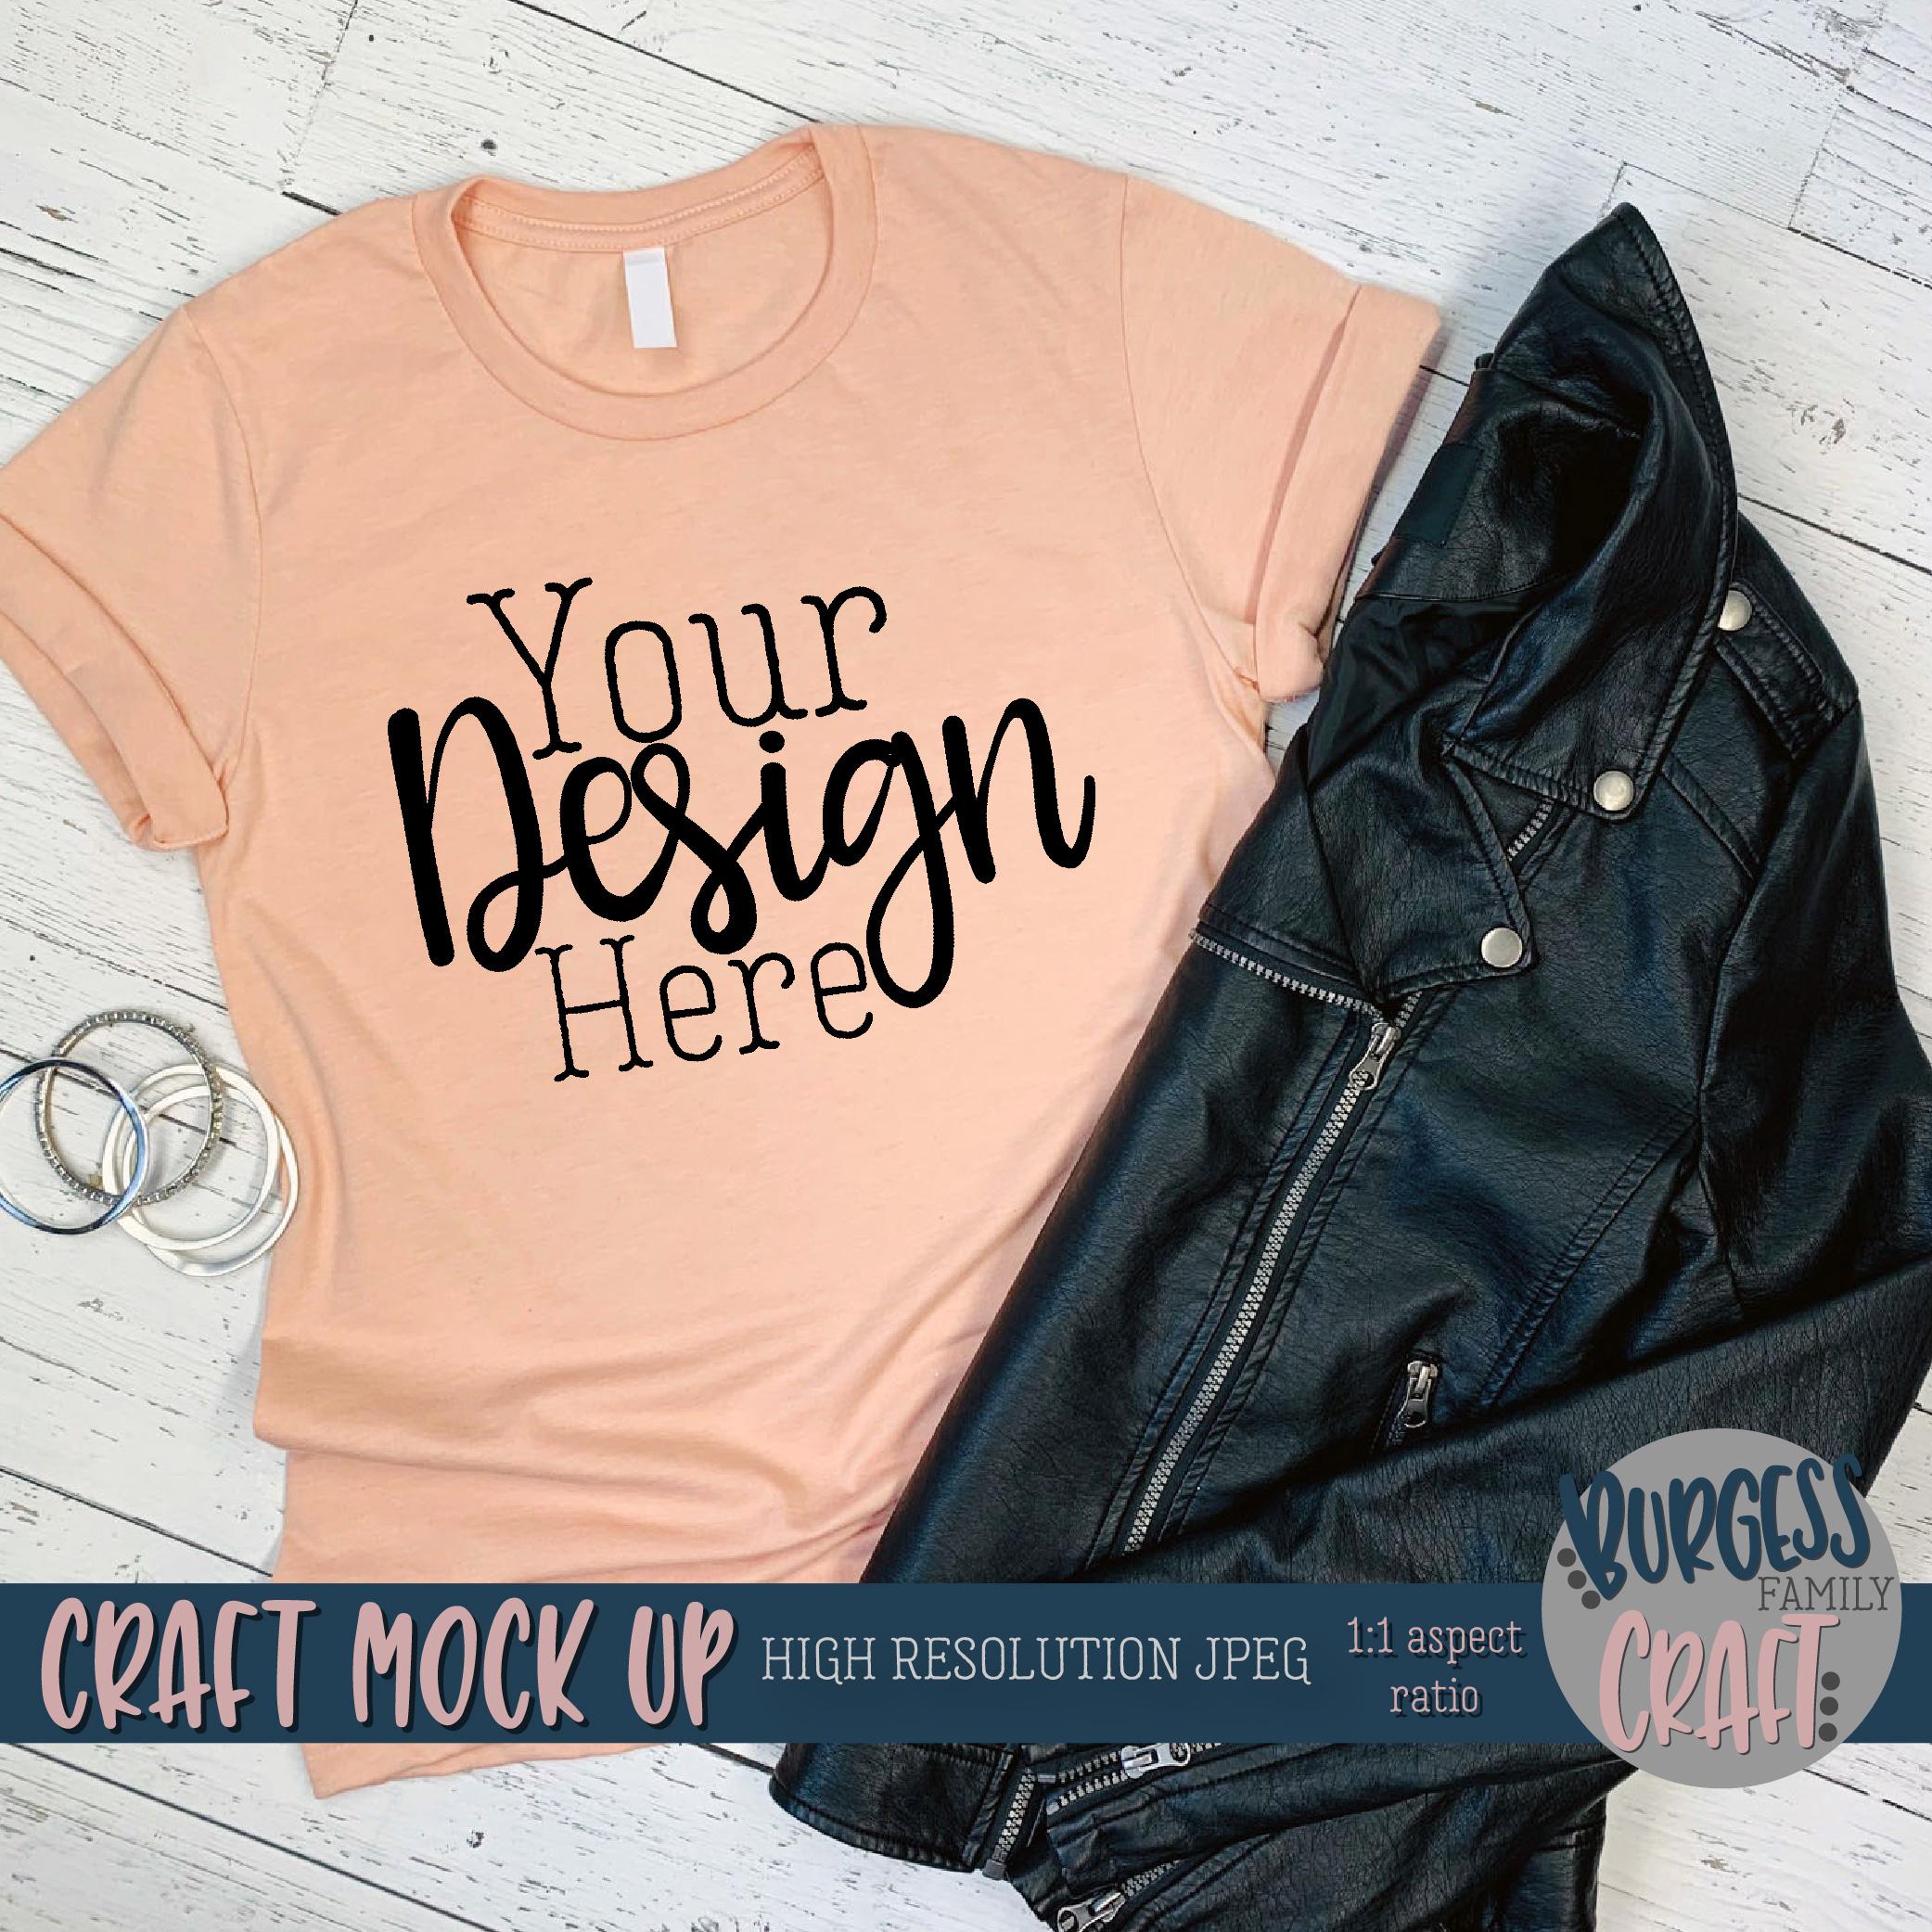 Edgy peach 3001 shirt Craft mock up | High Res JPEG example image 2